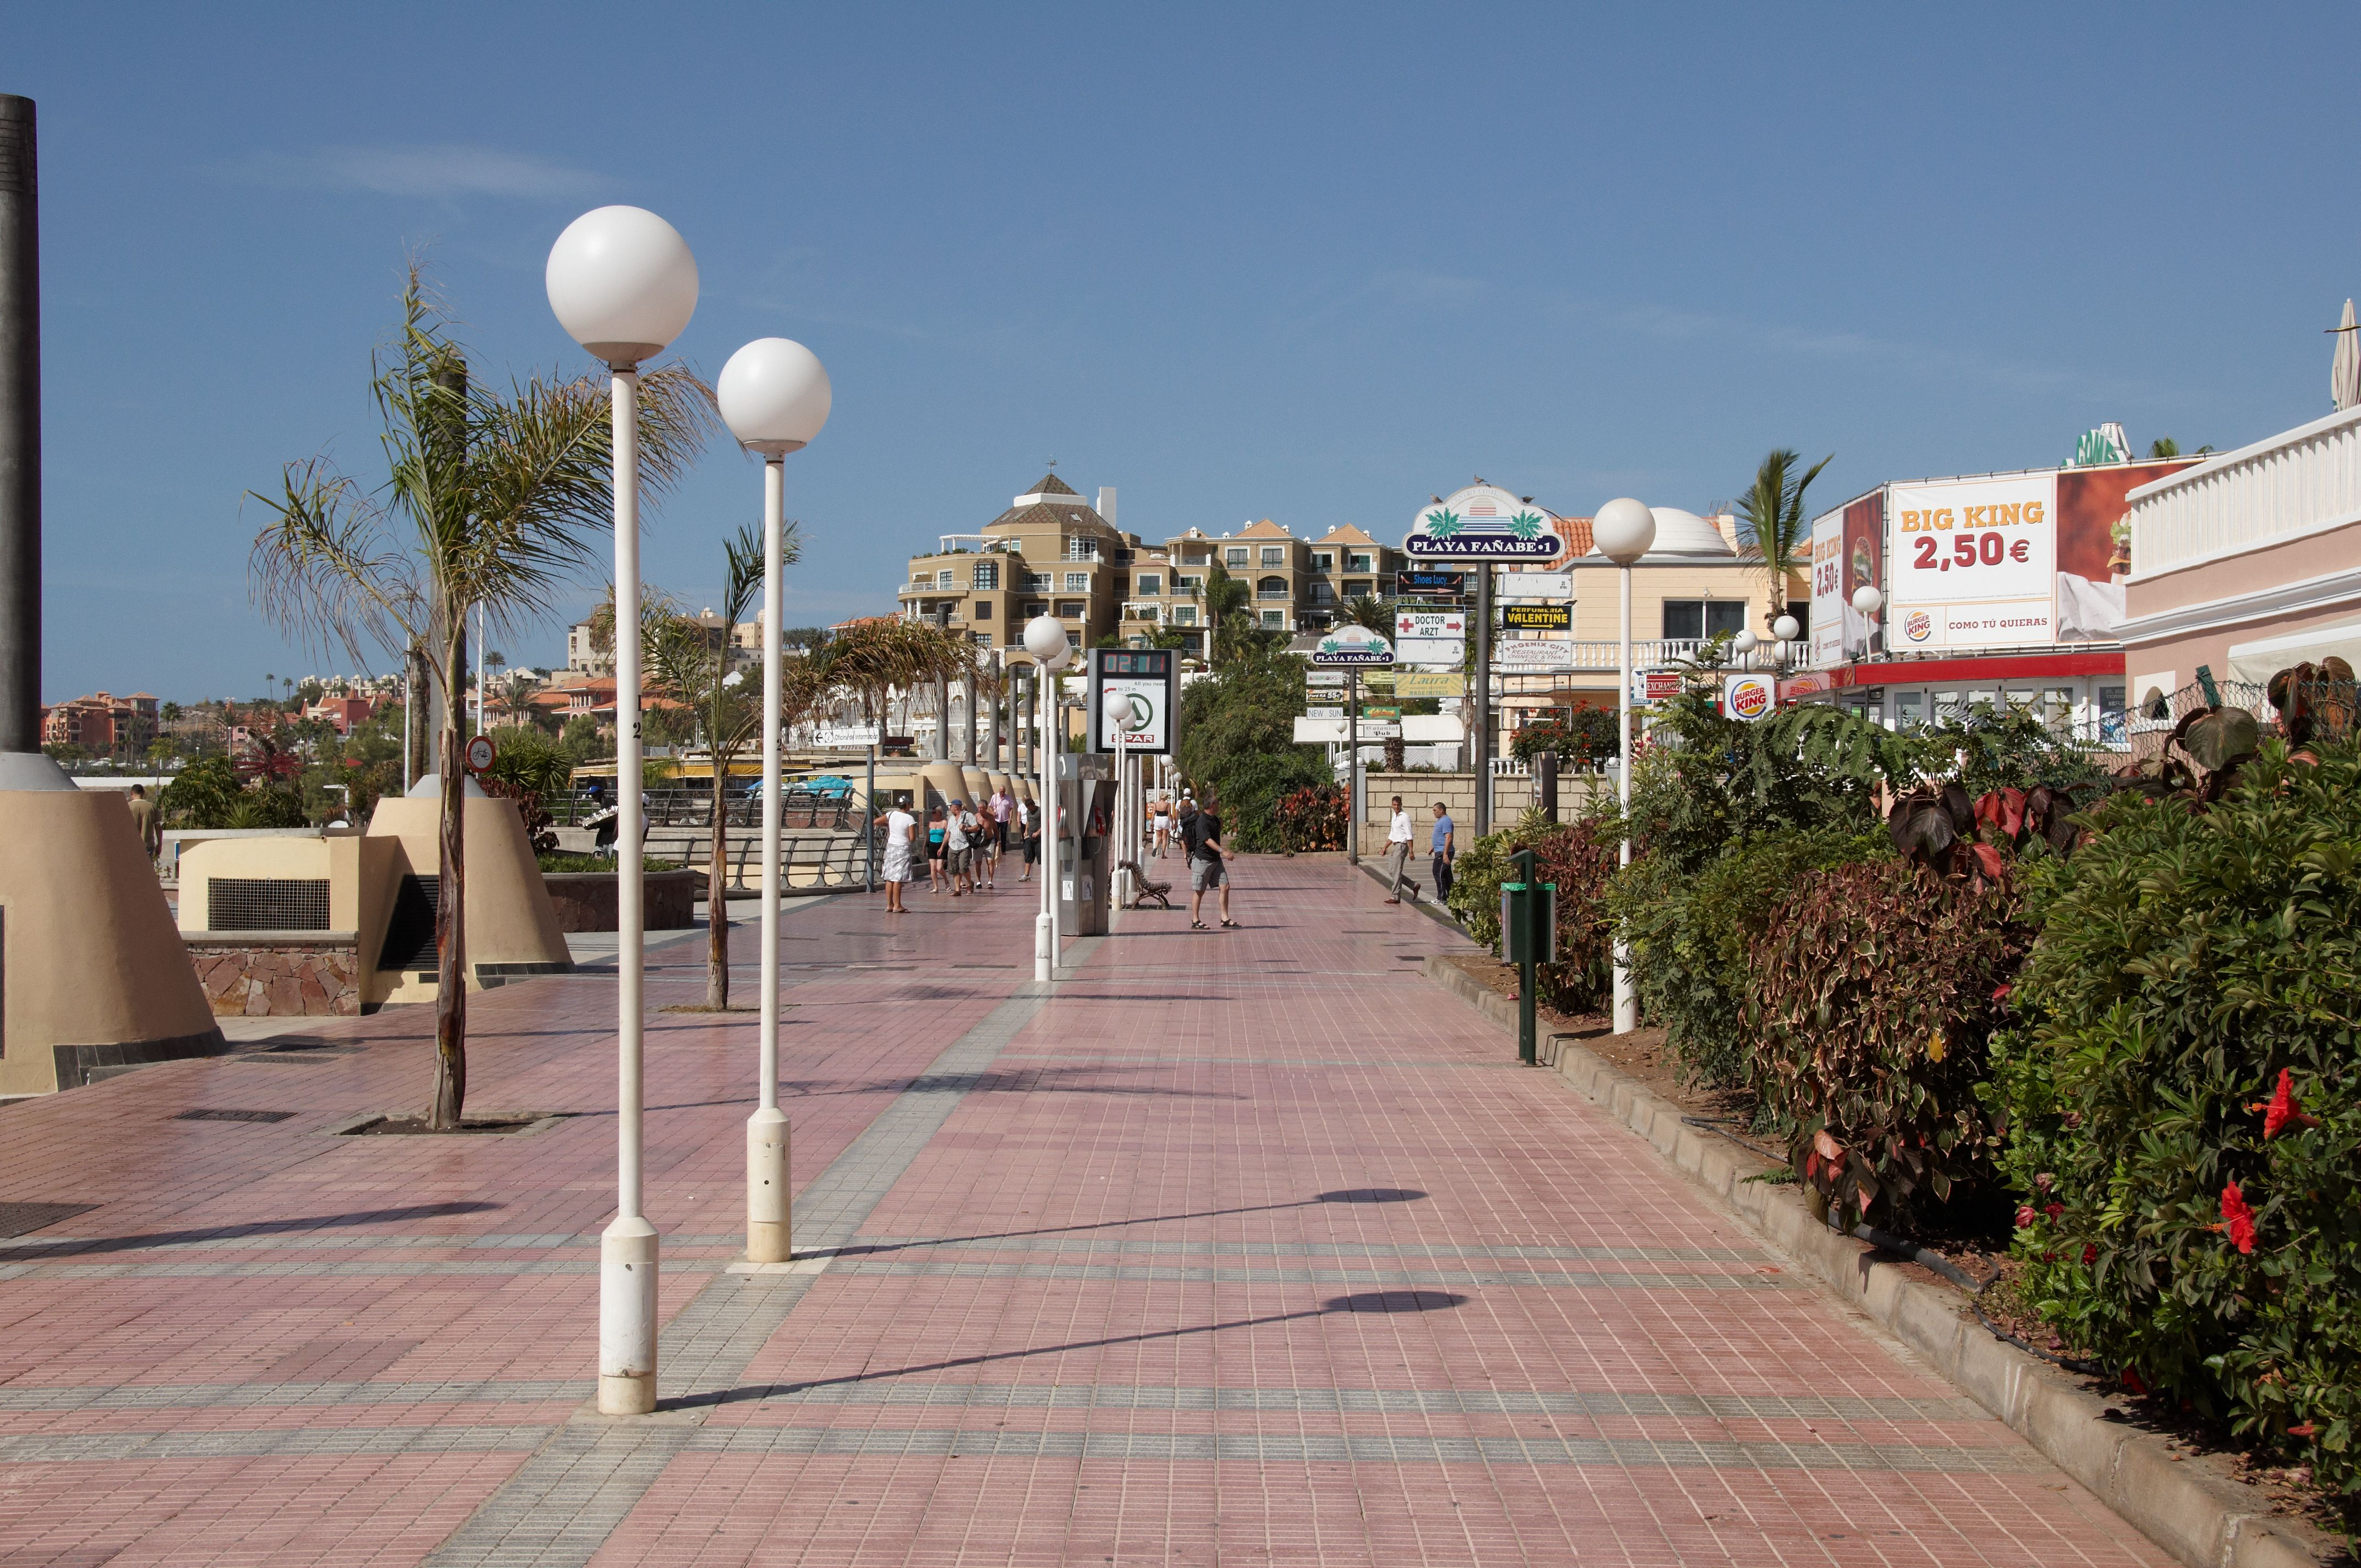 Adeje Hotel Tenerife